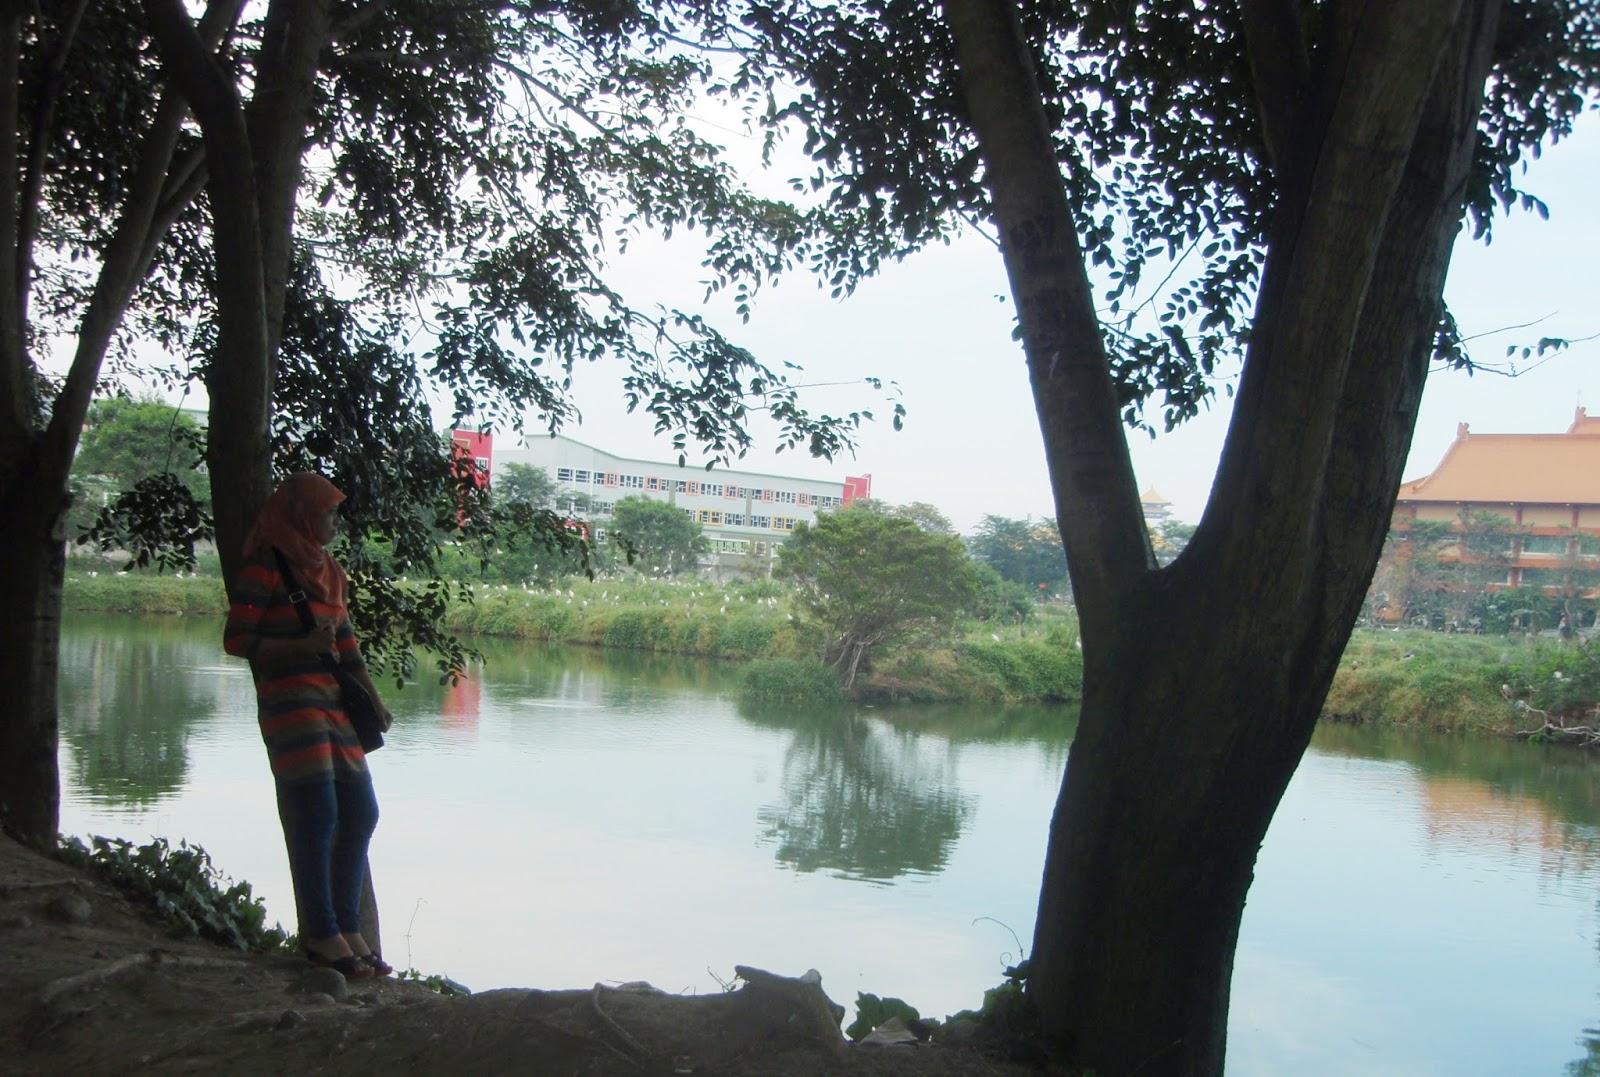 Cemara Asri Medan Wisata Murah Meriah Bangunan Megah Diatas Tidak